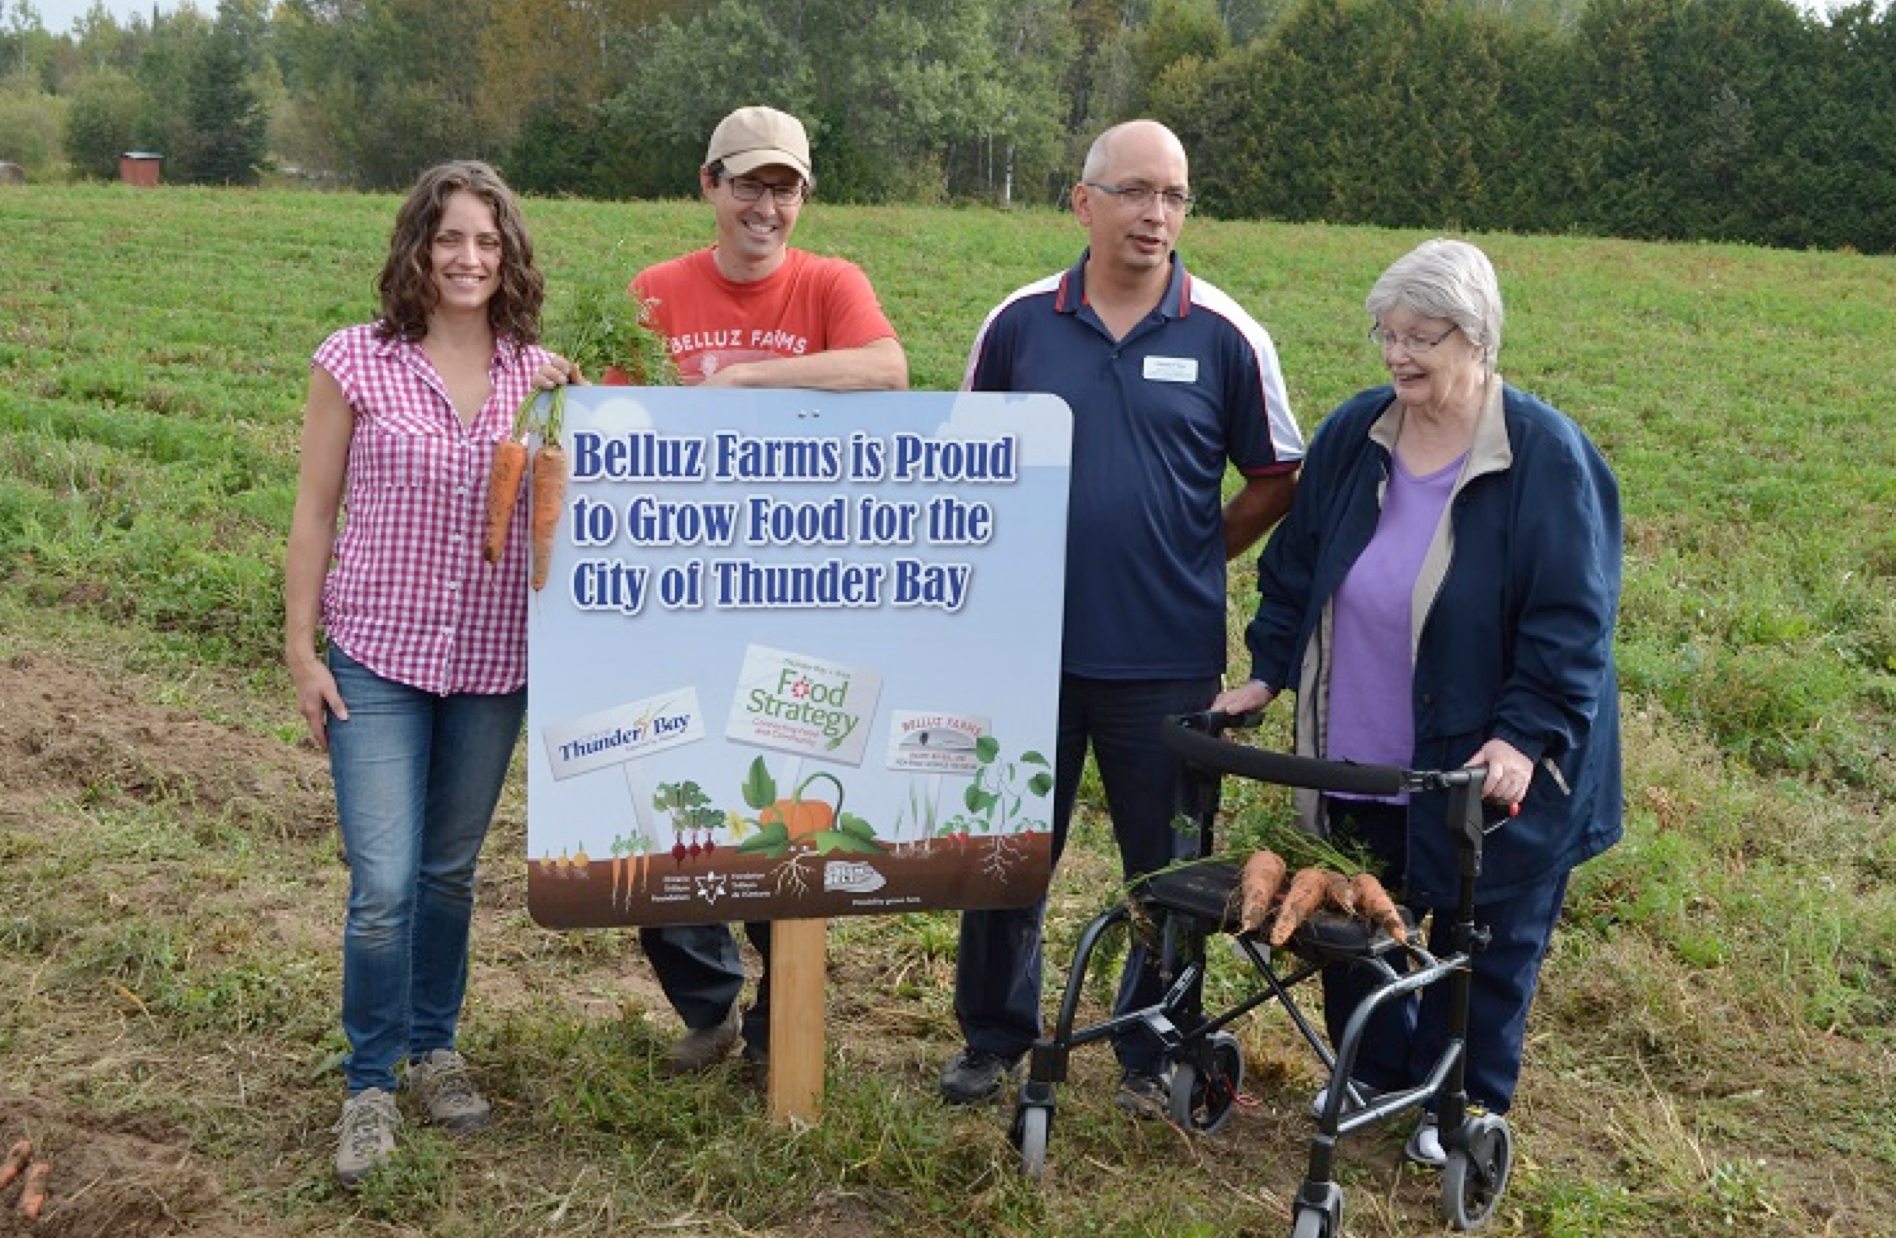 Caption: Successful Food Partnership between City Thunder Bay, Long Term Care and Regional Producer Belluz Farms